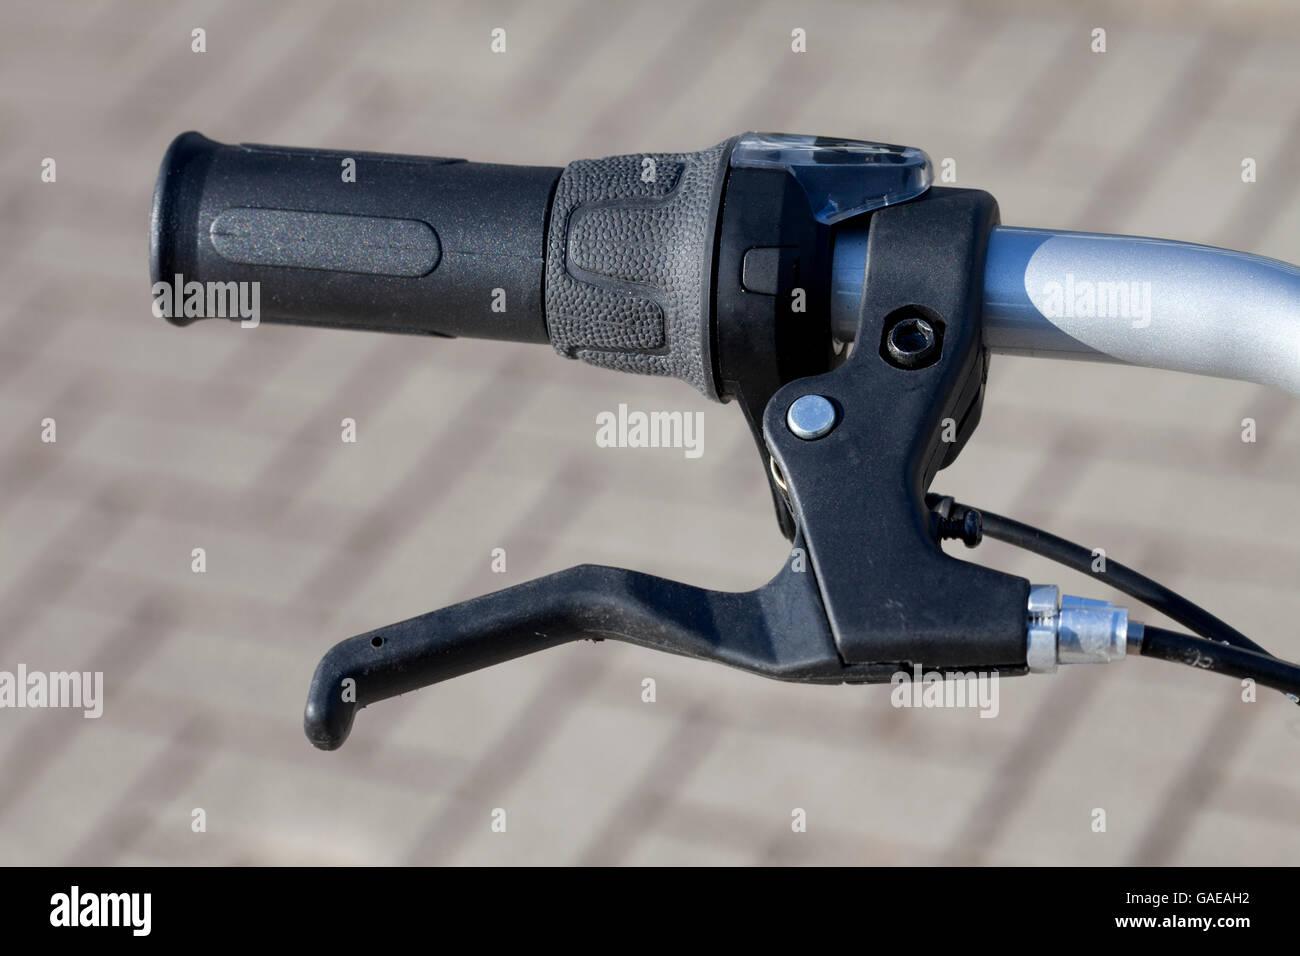 Handlebars, handle and hand brake - Stock Image